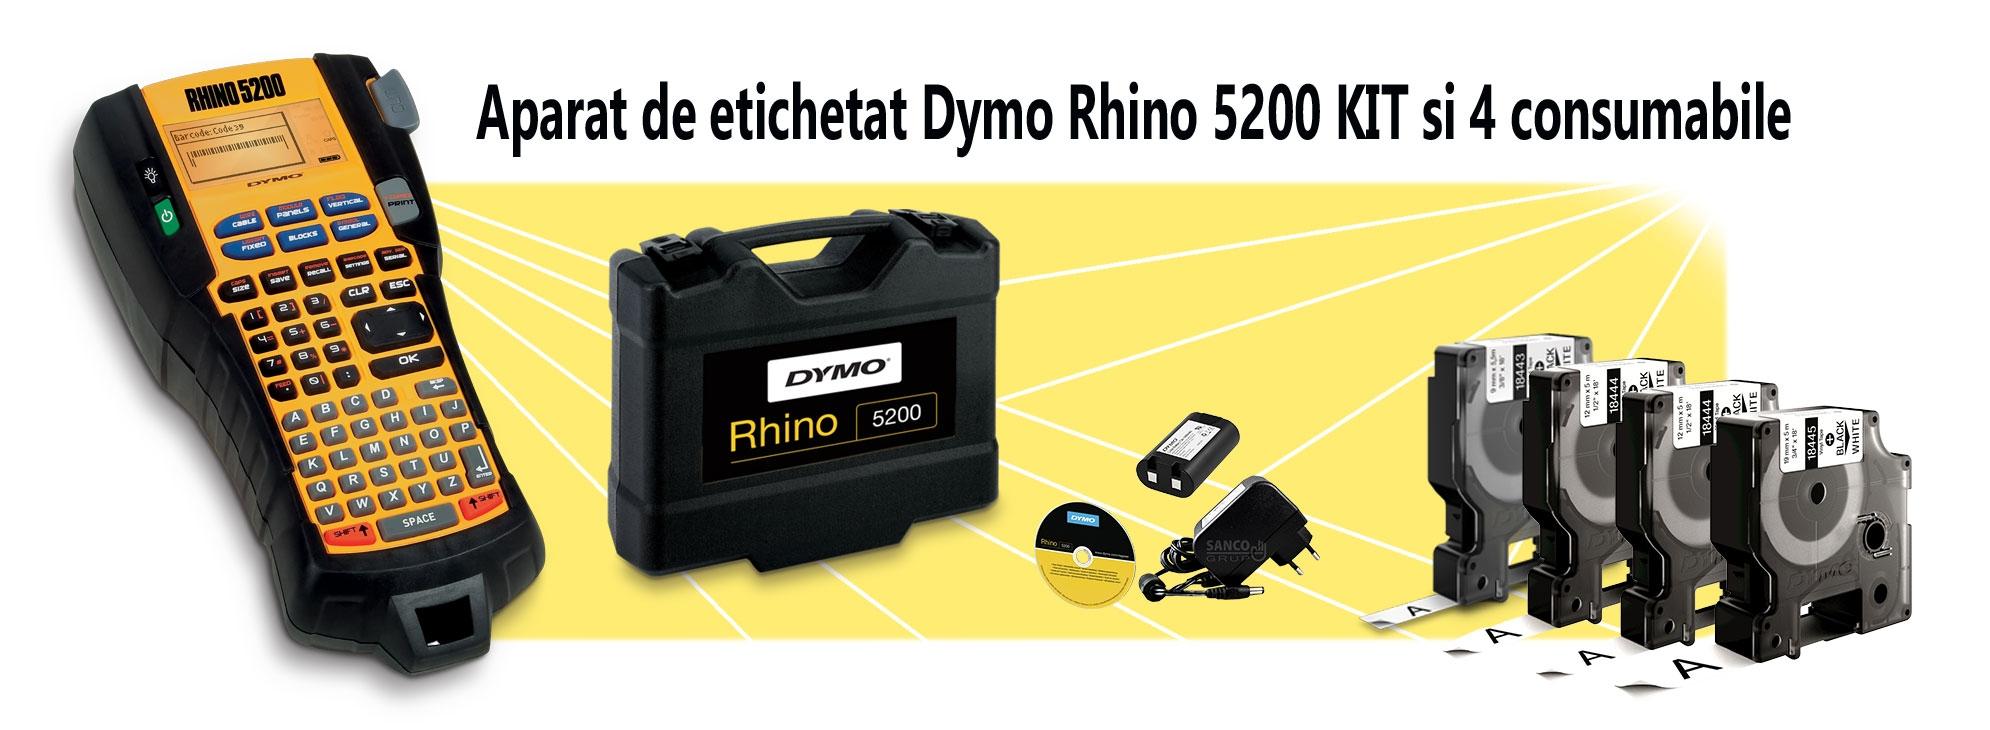 https://www.sancogrup.ro/imprimante-industriale/aparat-de-etichetat-dymo-rhino-5200-kit-si-4-x-banda-vinil.html